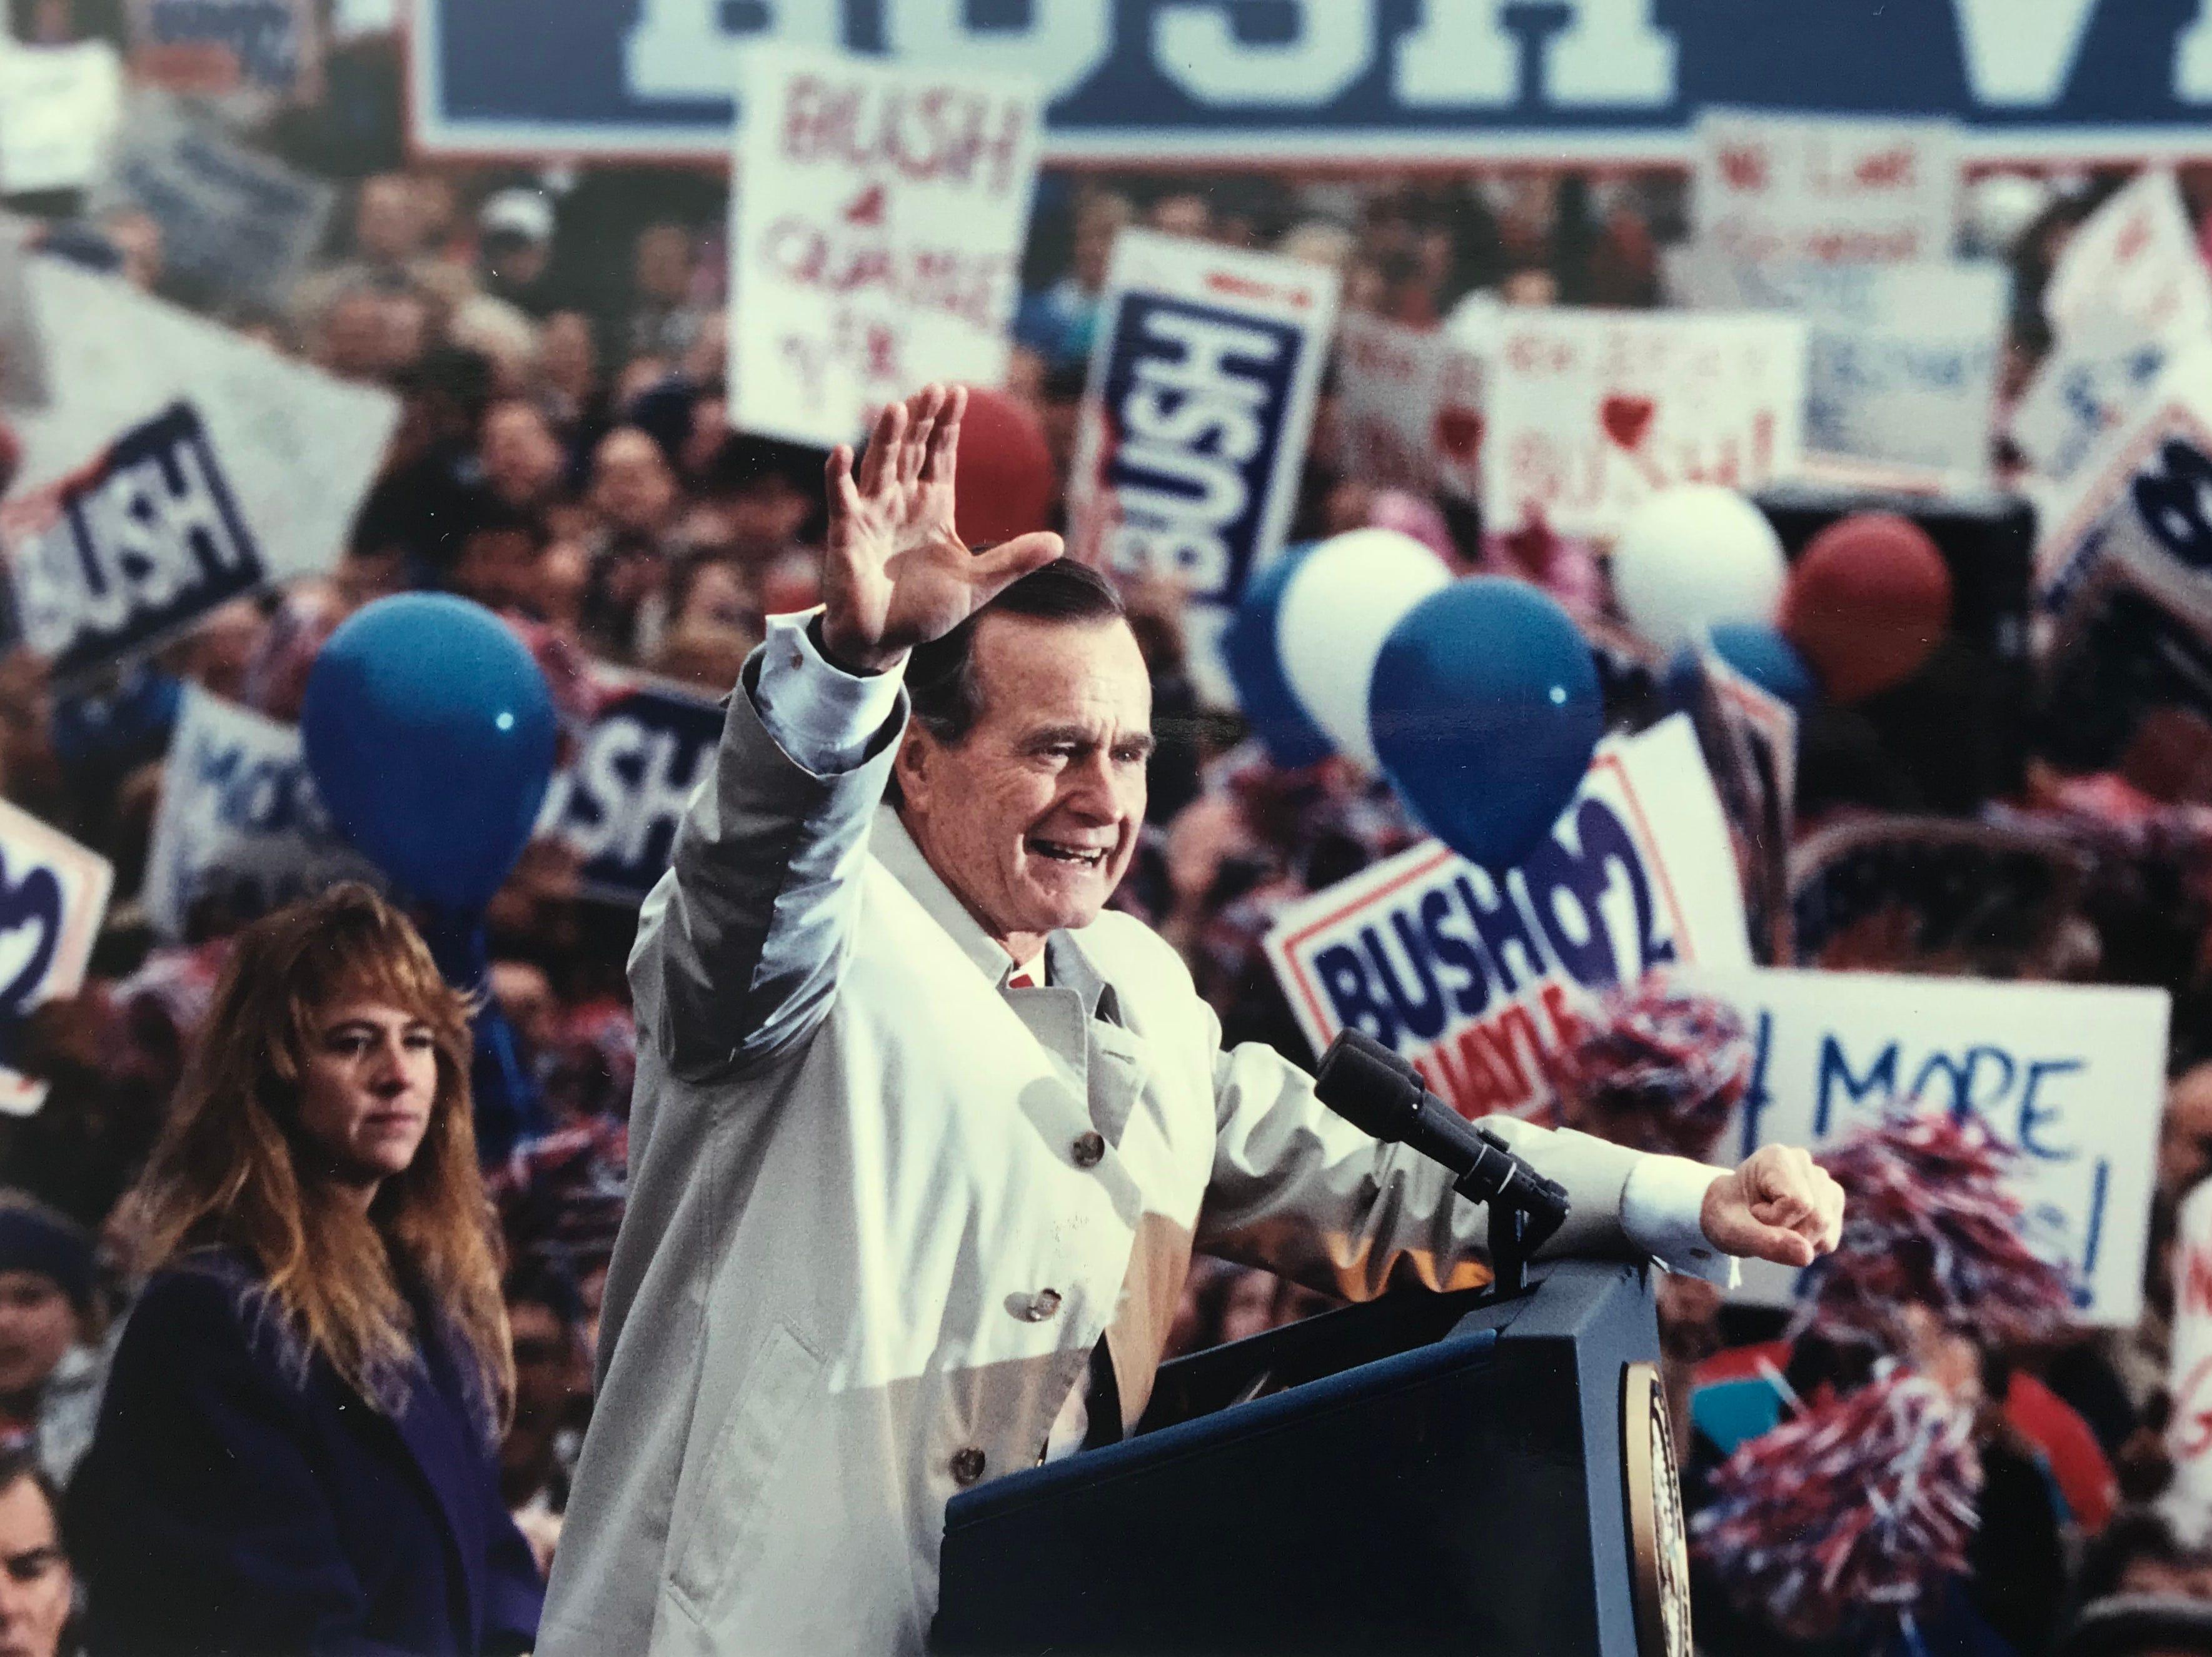 President Bush during a morning rally outside Madison (NJ) Town Hall on Nov. 2, 1992.